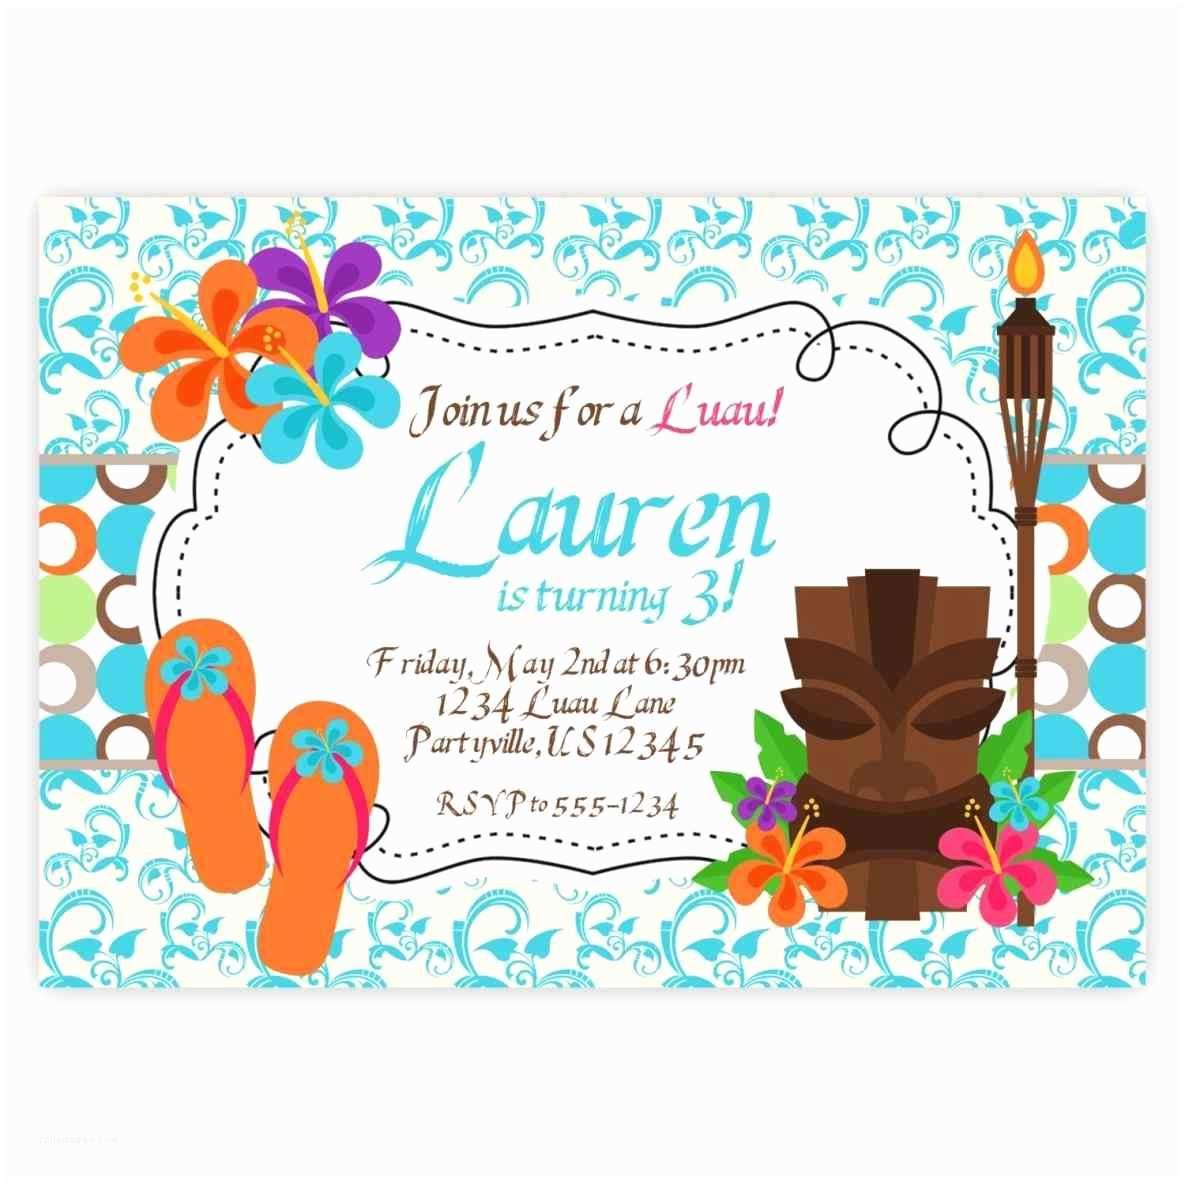 Luau Birthday Party Invitations Print at Home Diy Invitation Blank Luau Party Invitations